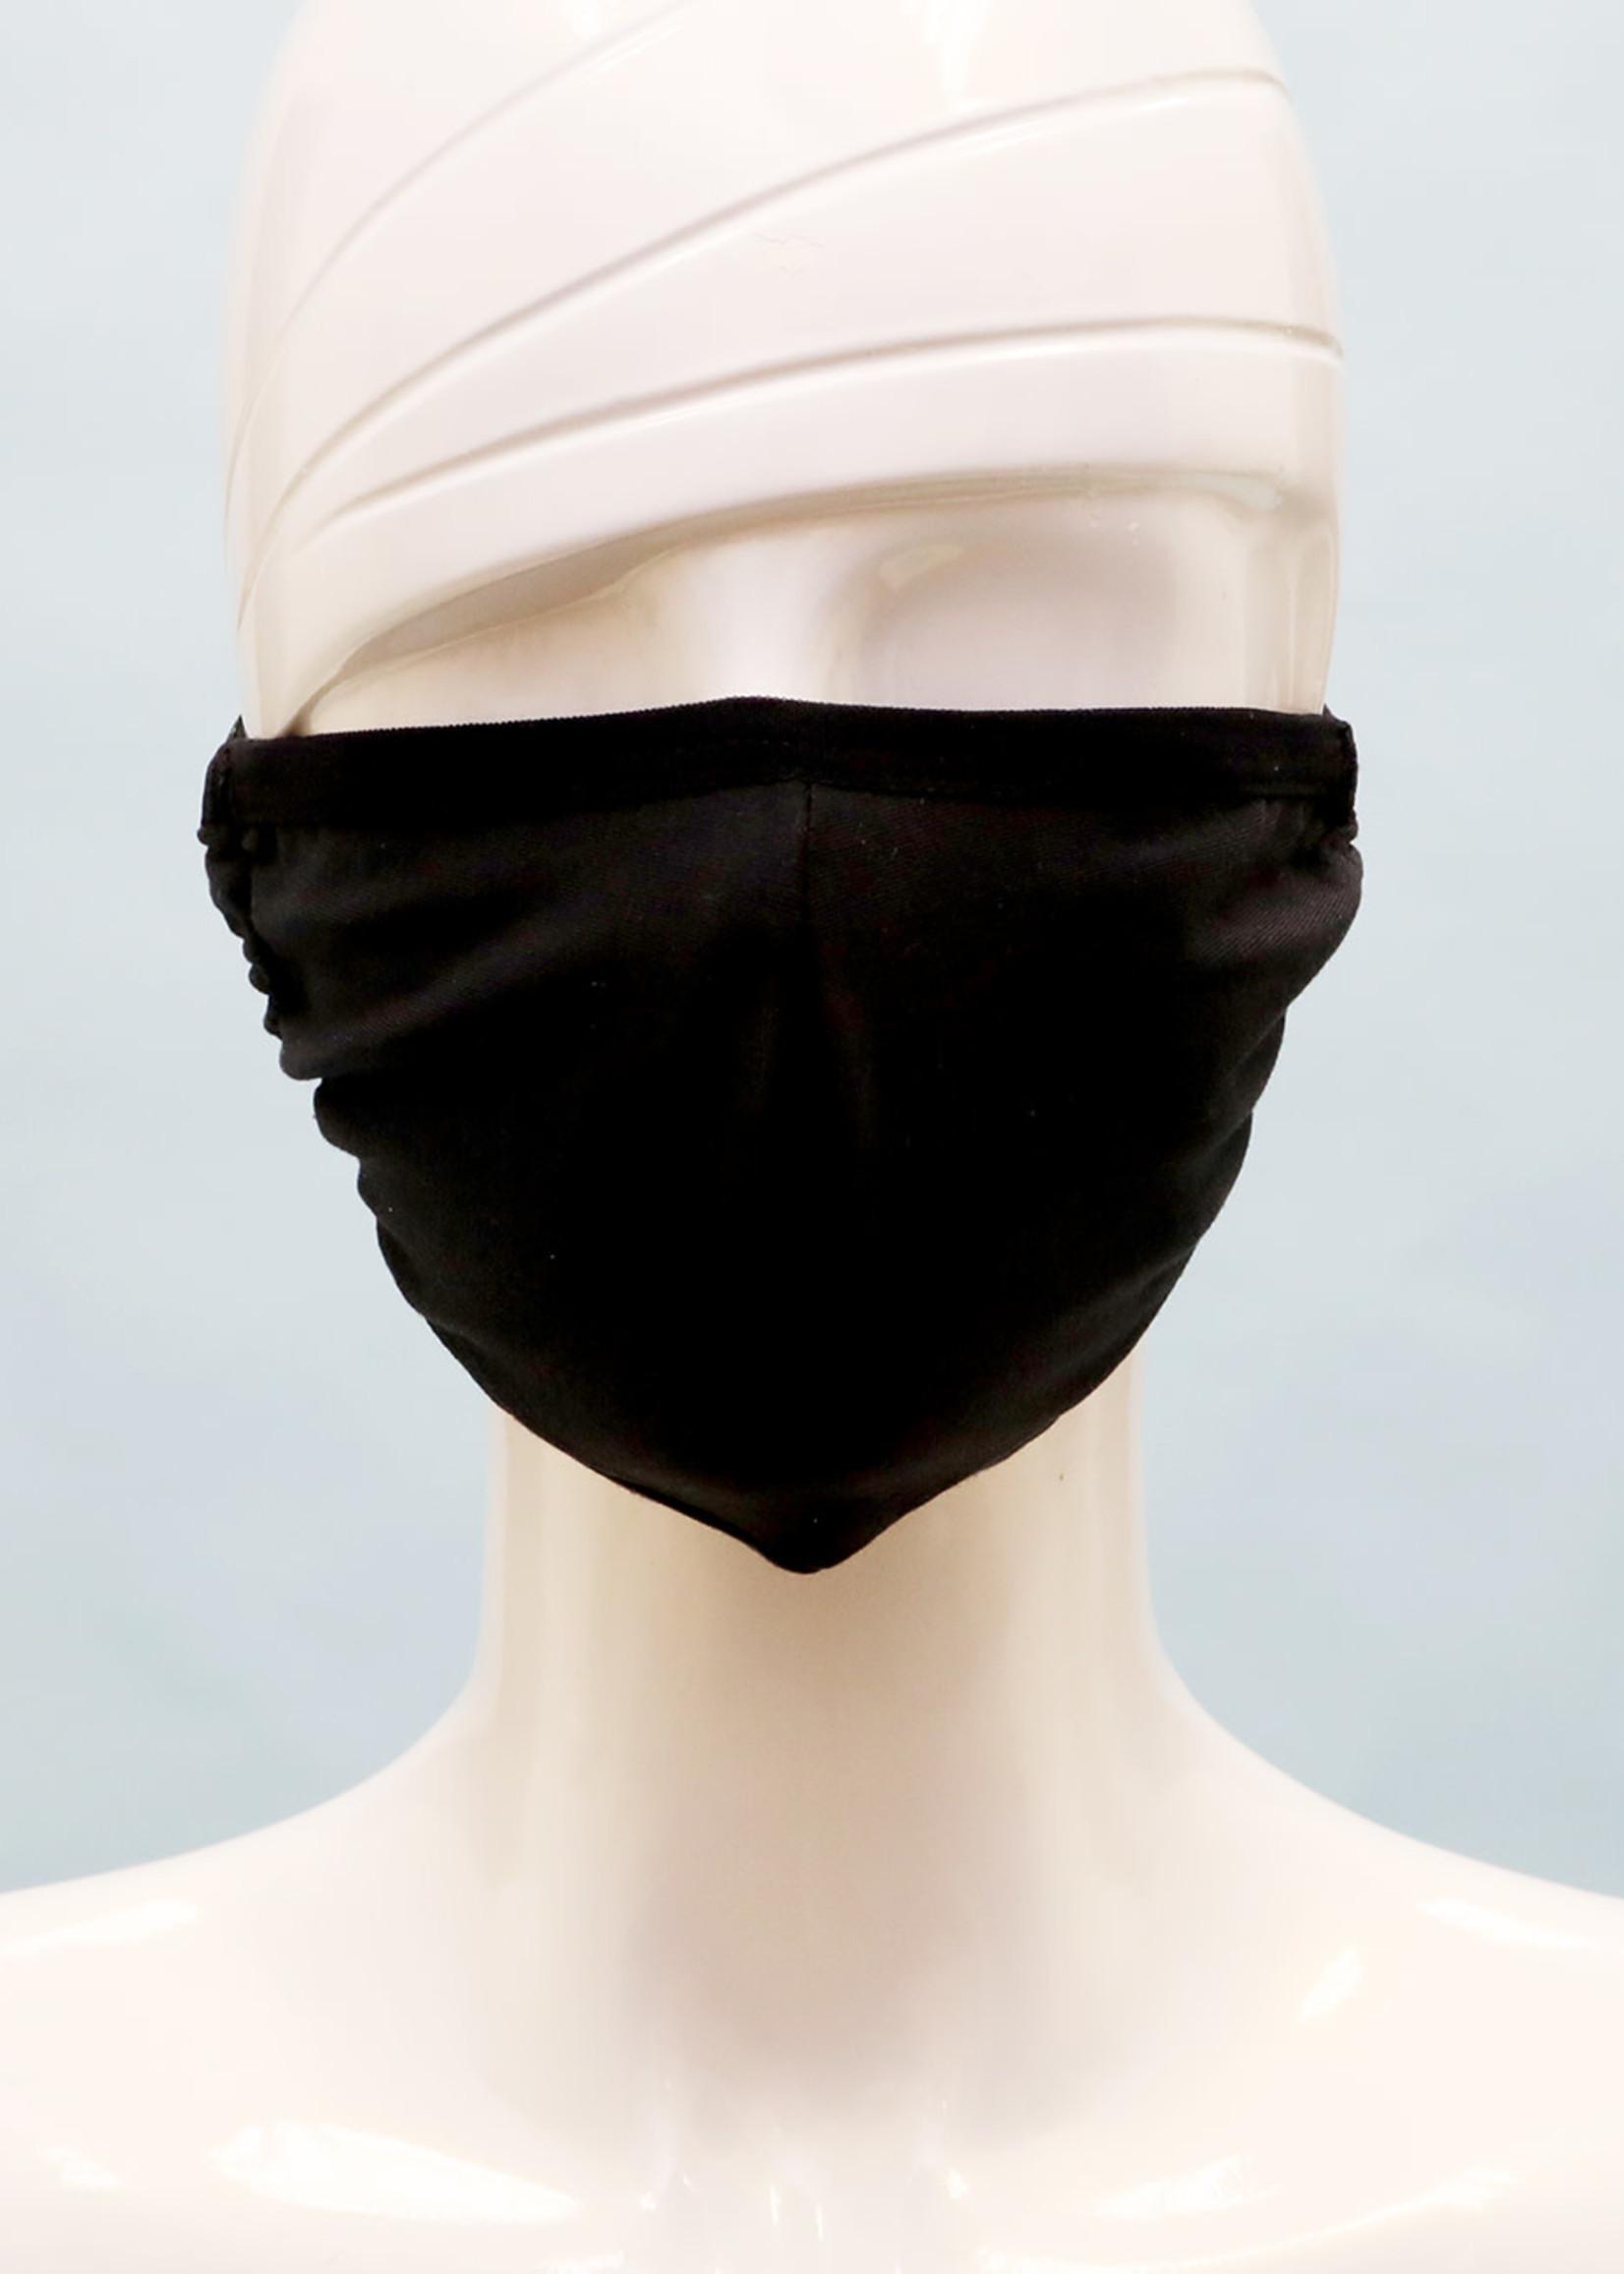 Face Mask (Black)-Cotton w/ Interior Pocket; Adjustable Ear Piece